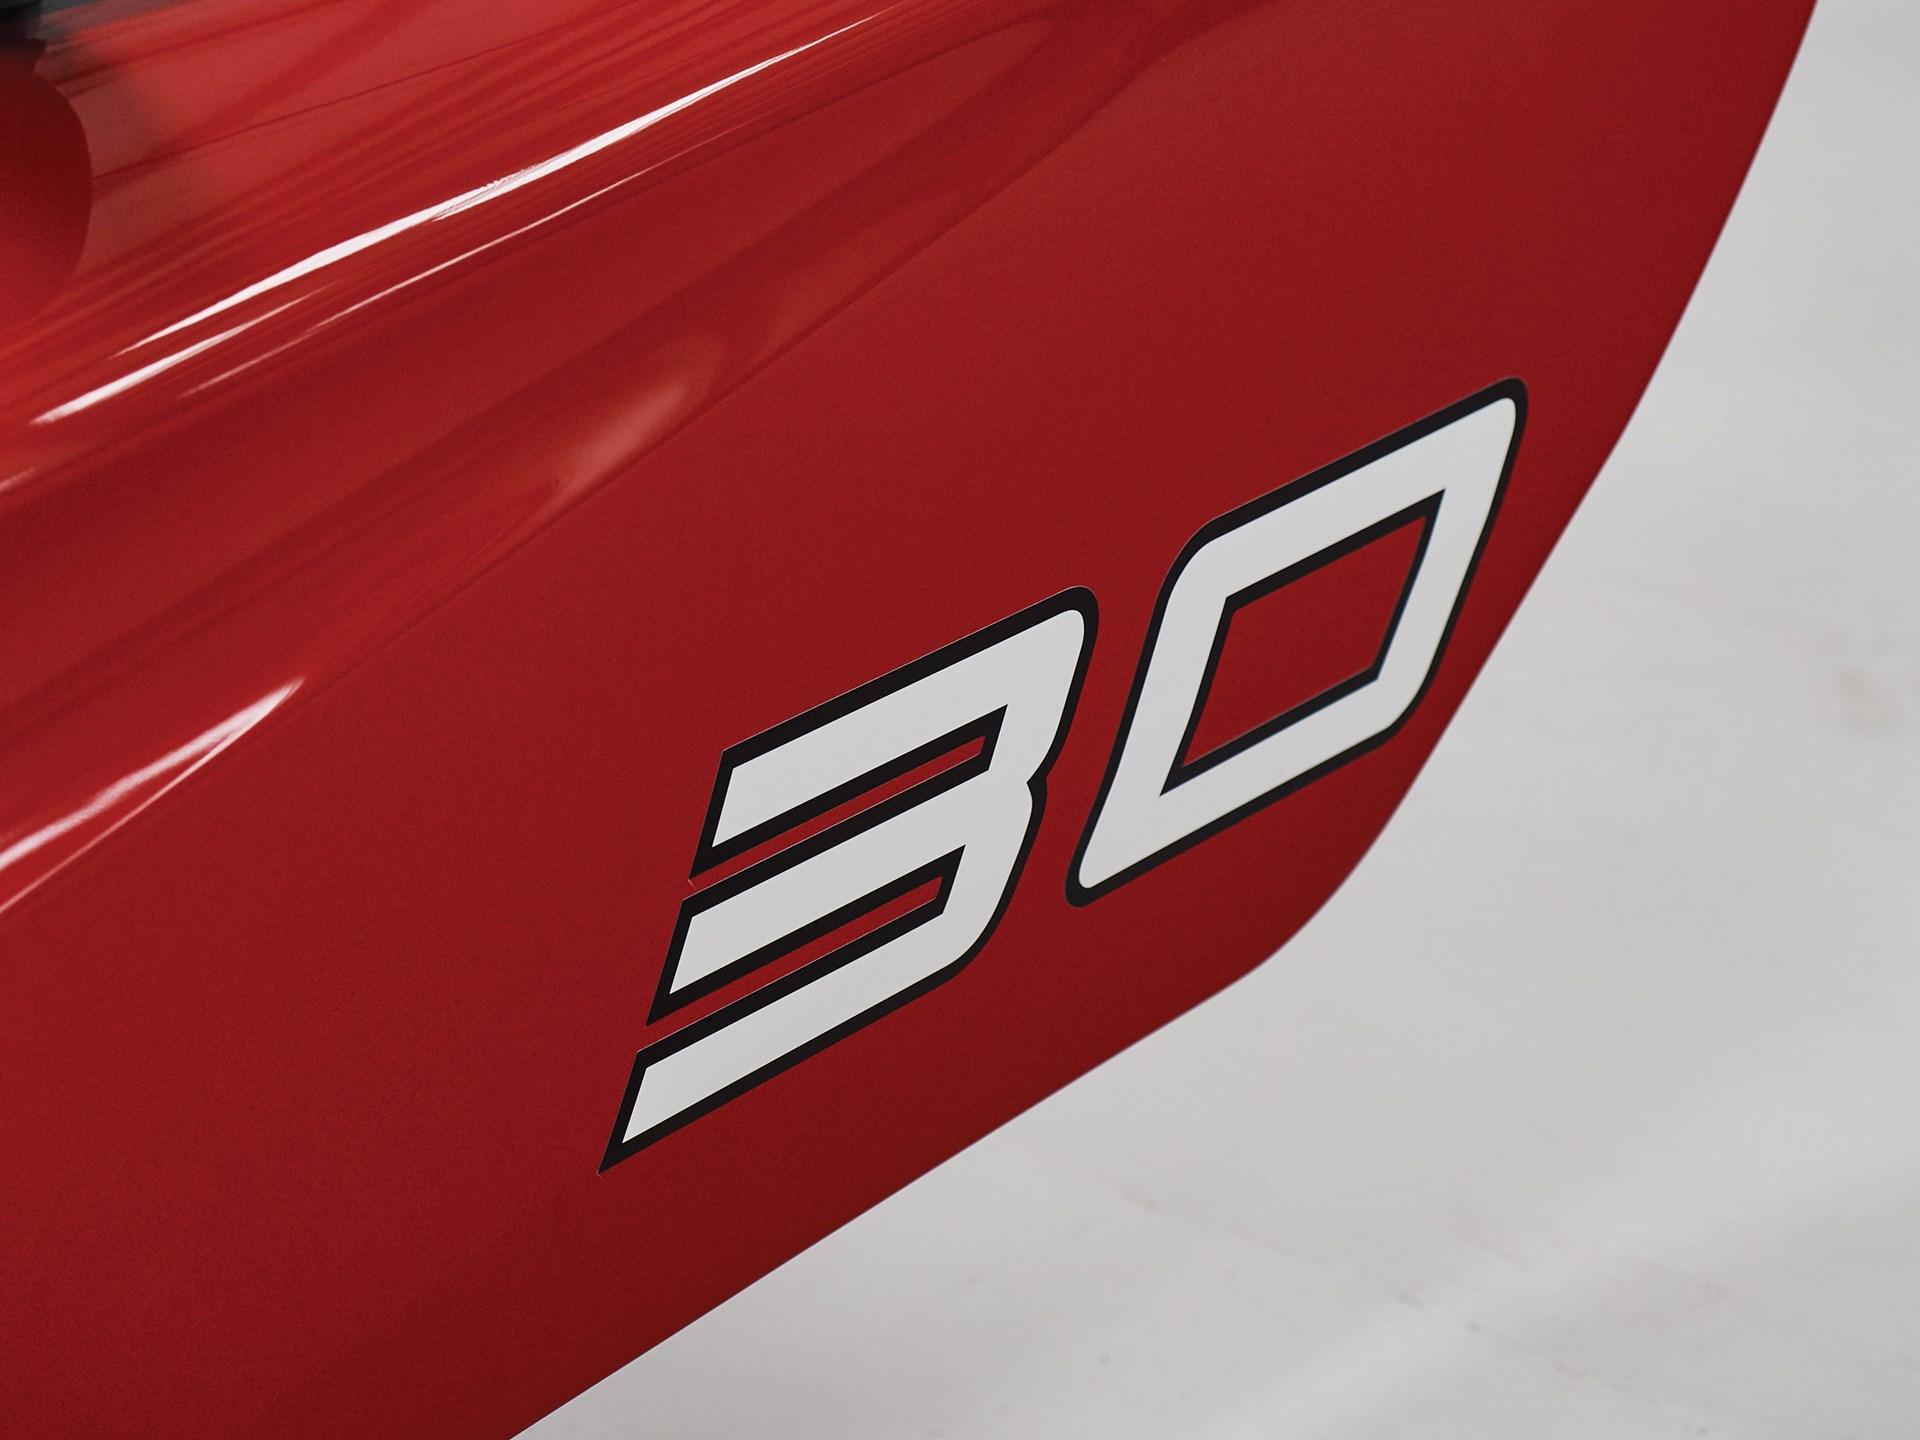 2011 Ferrari SP30